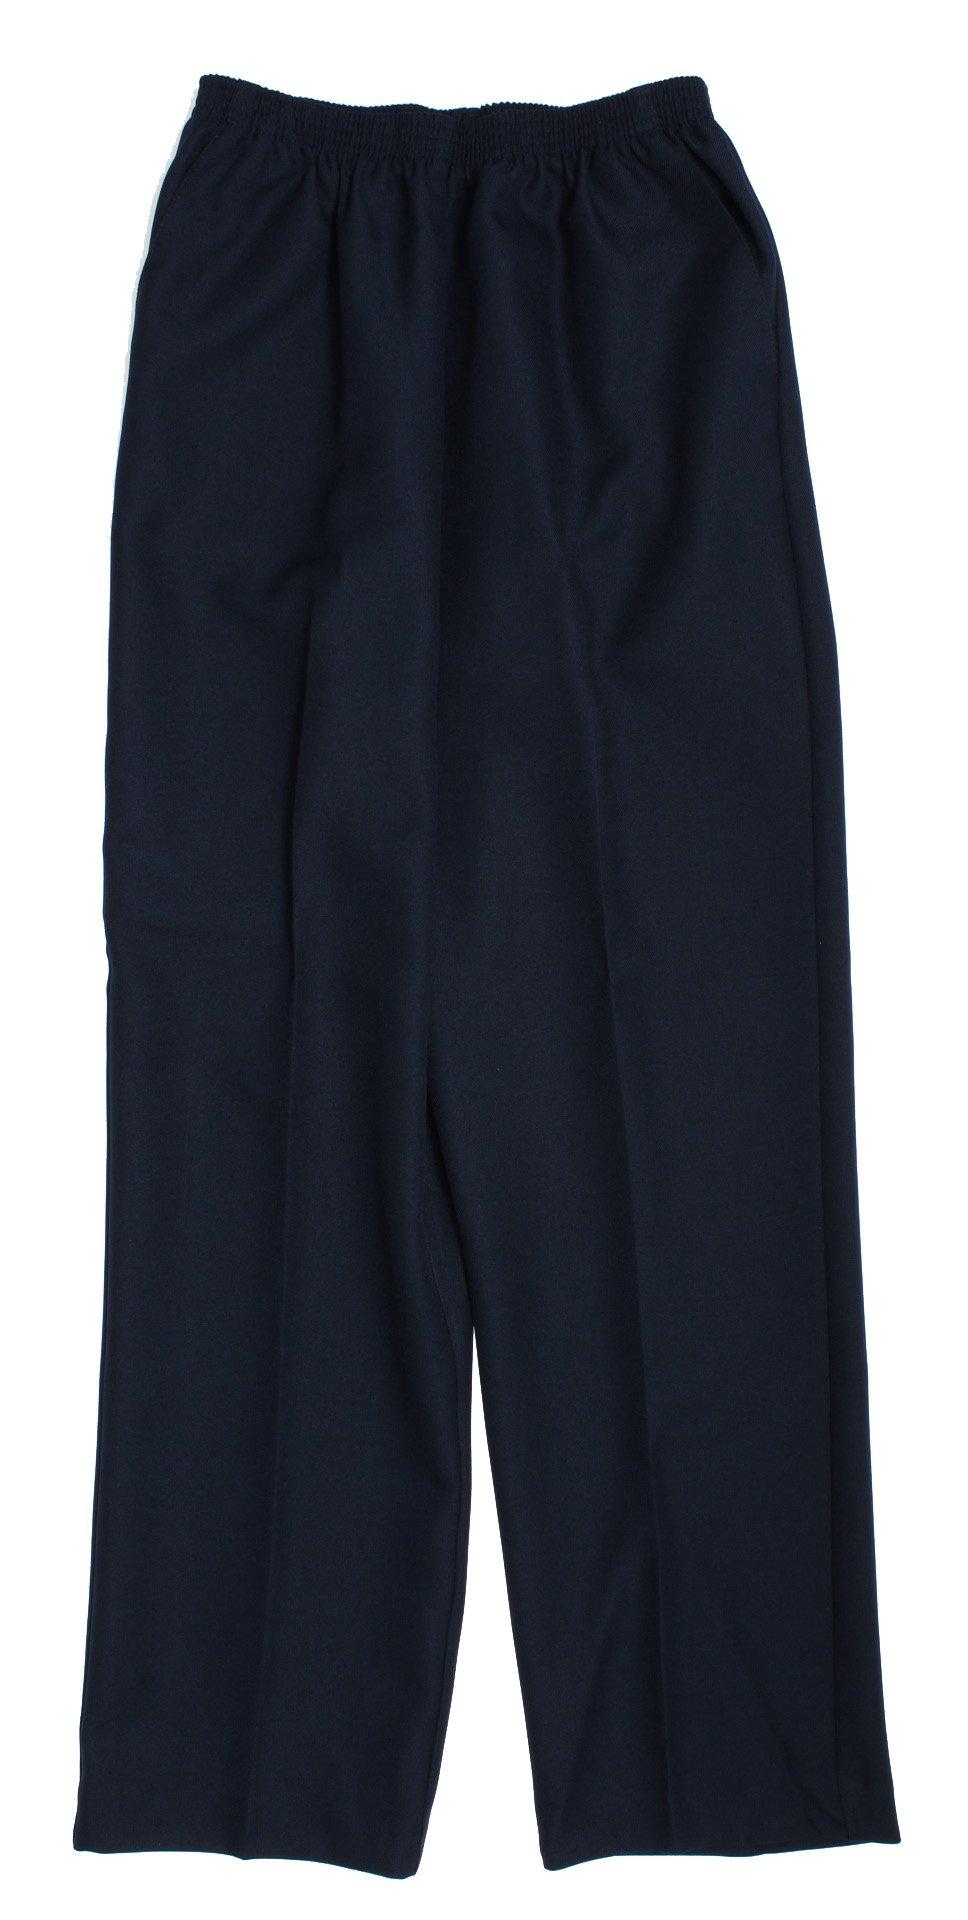 Alfred Dunner Classics Petite Elastic Waist Pants Navy 10P M